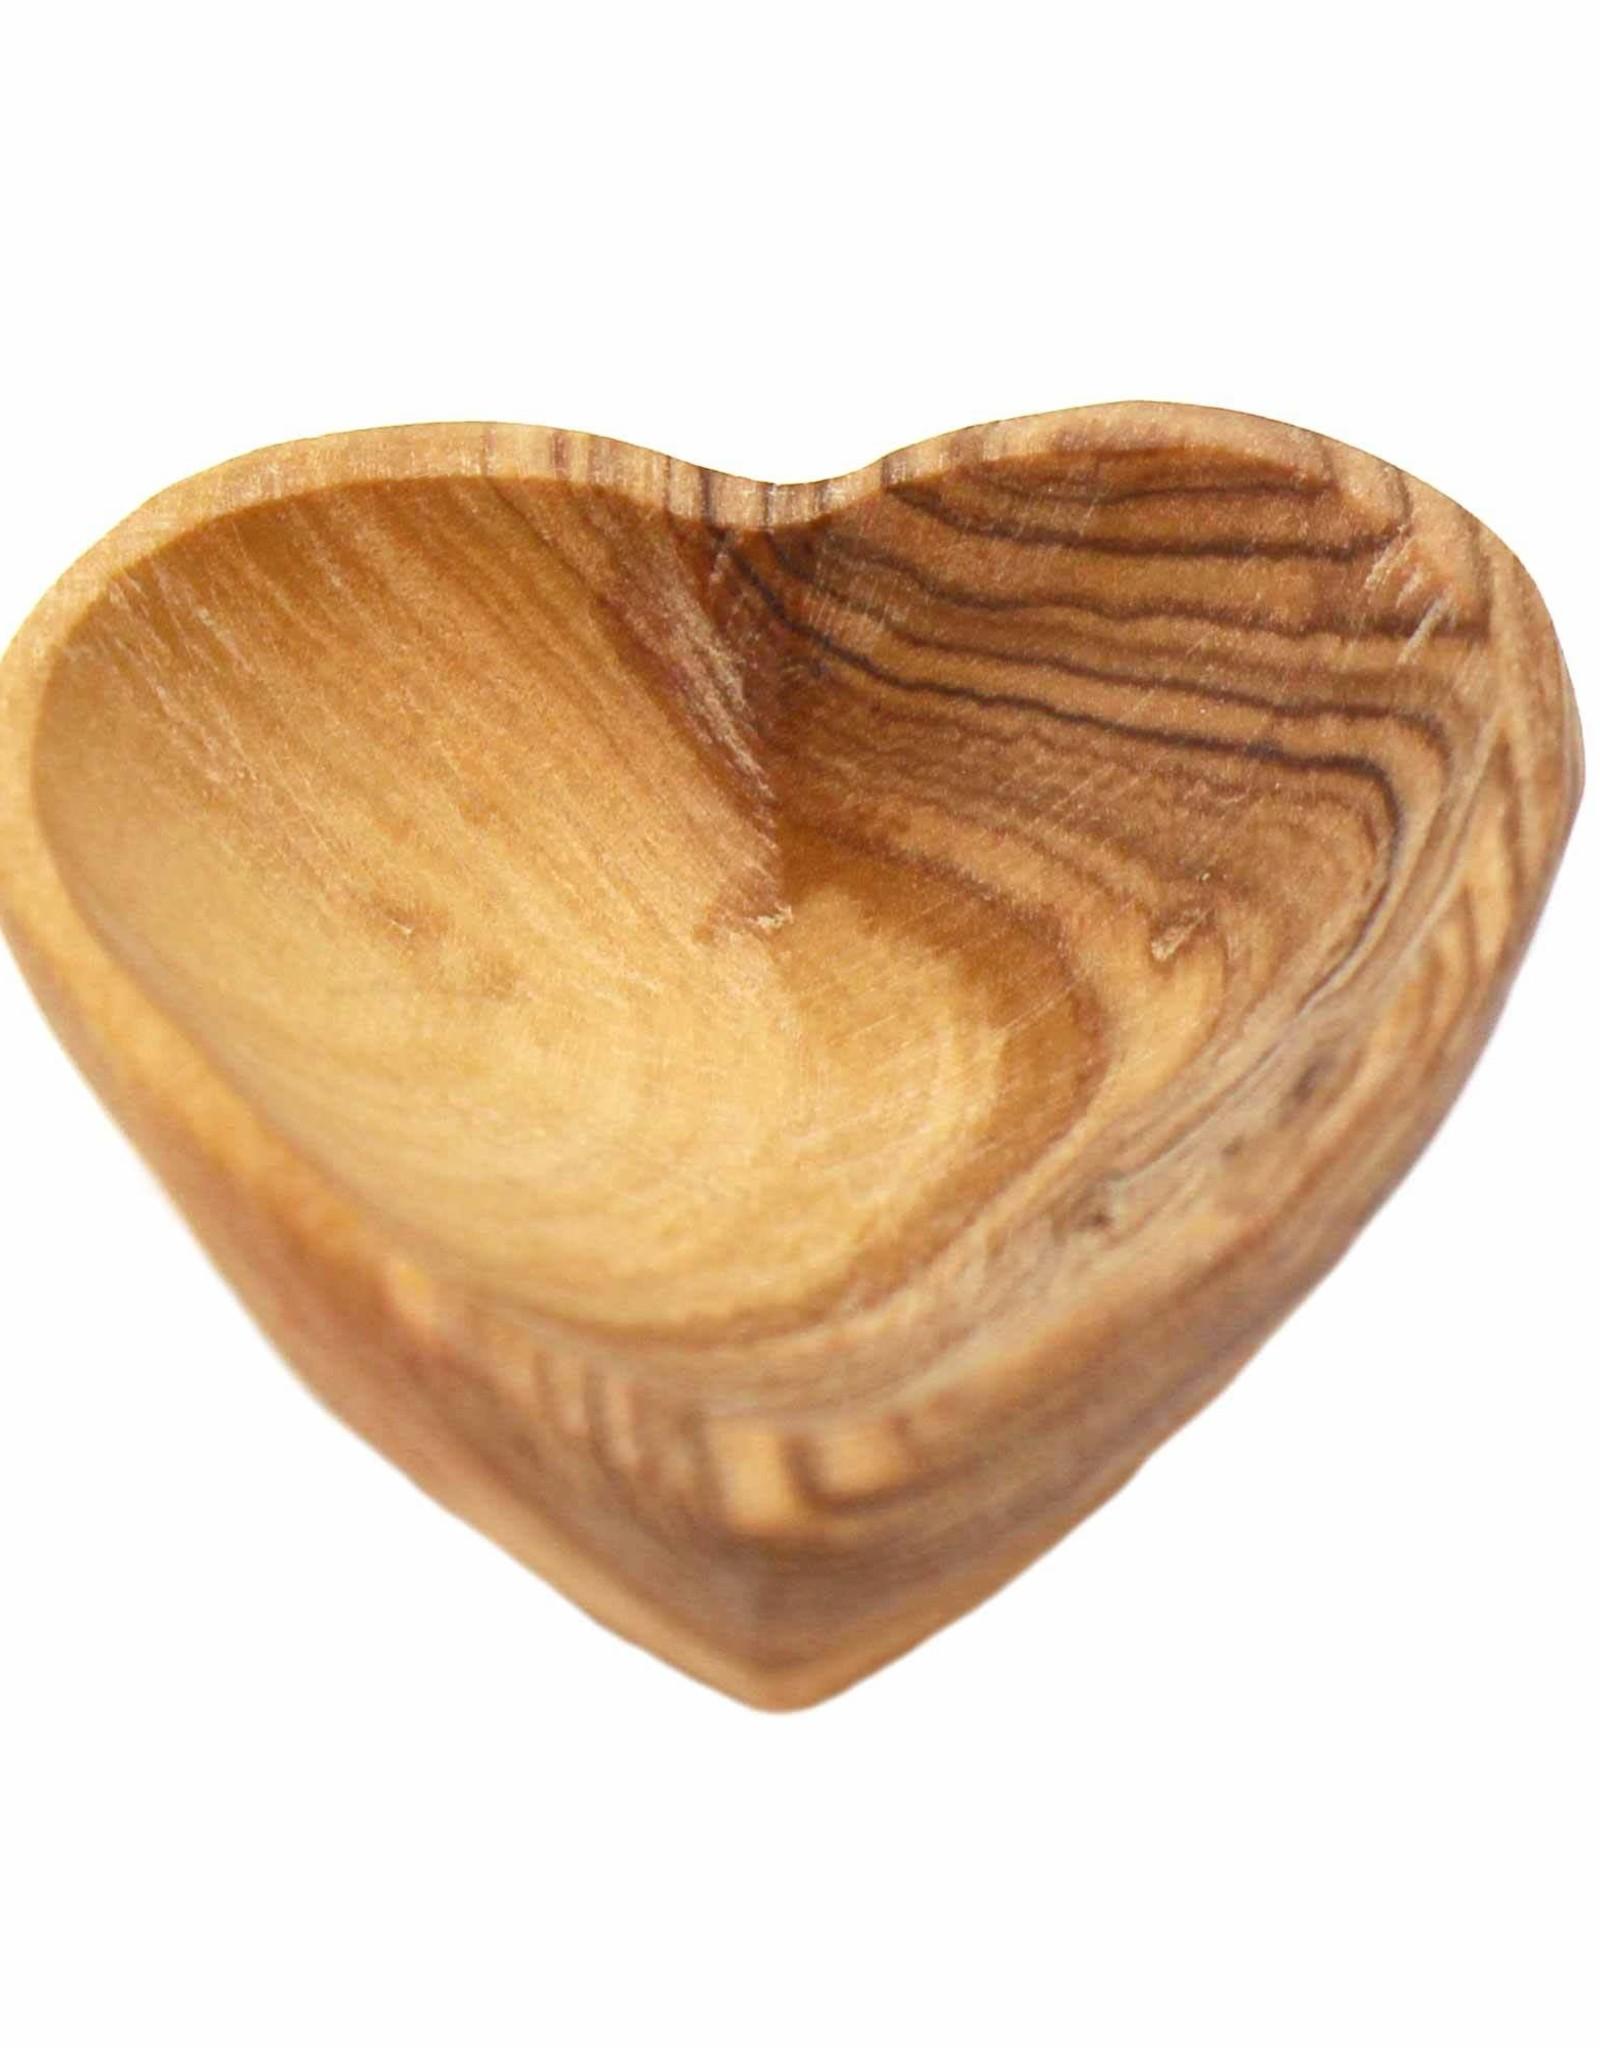 "Petite Olive Wood Heart Dish, 2"""